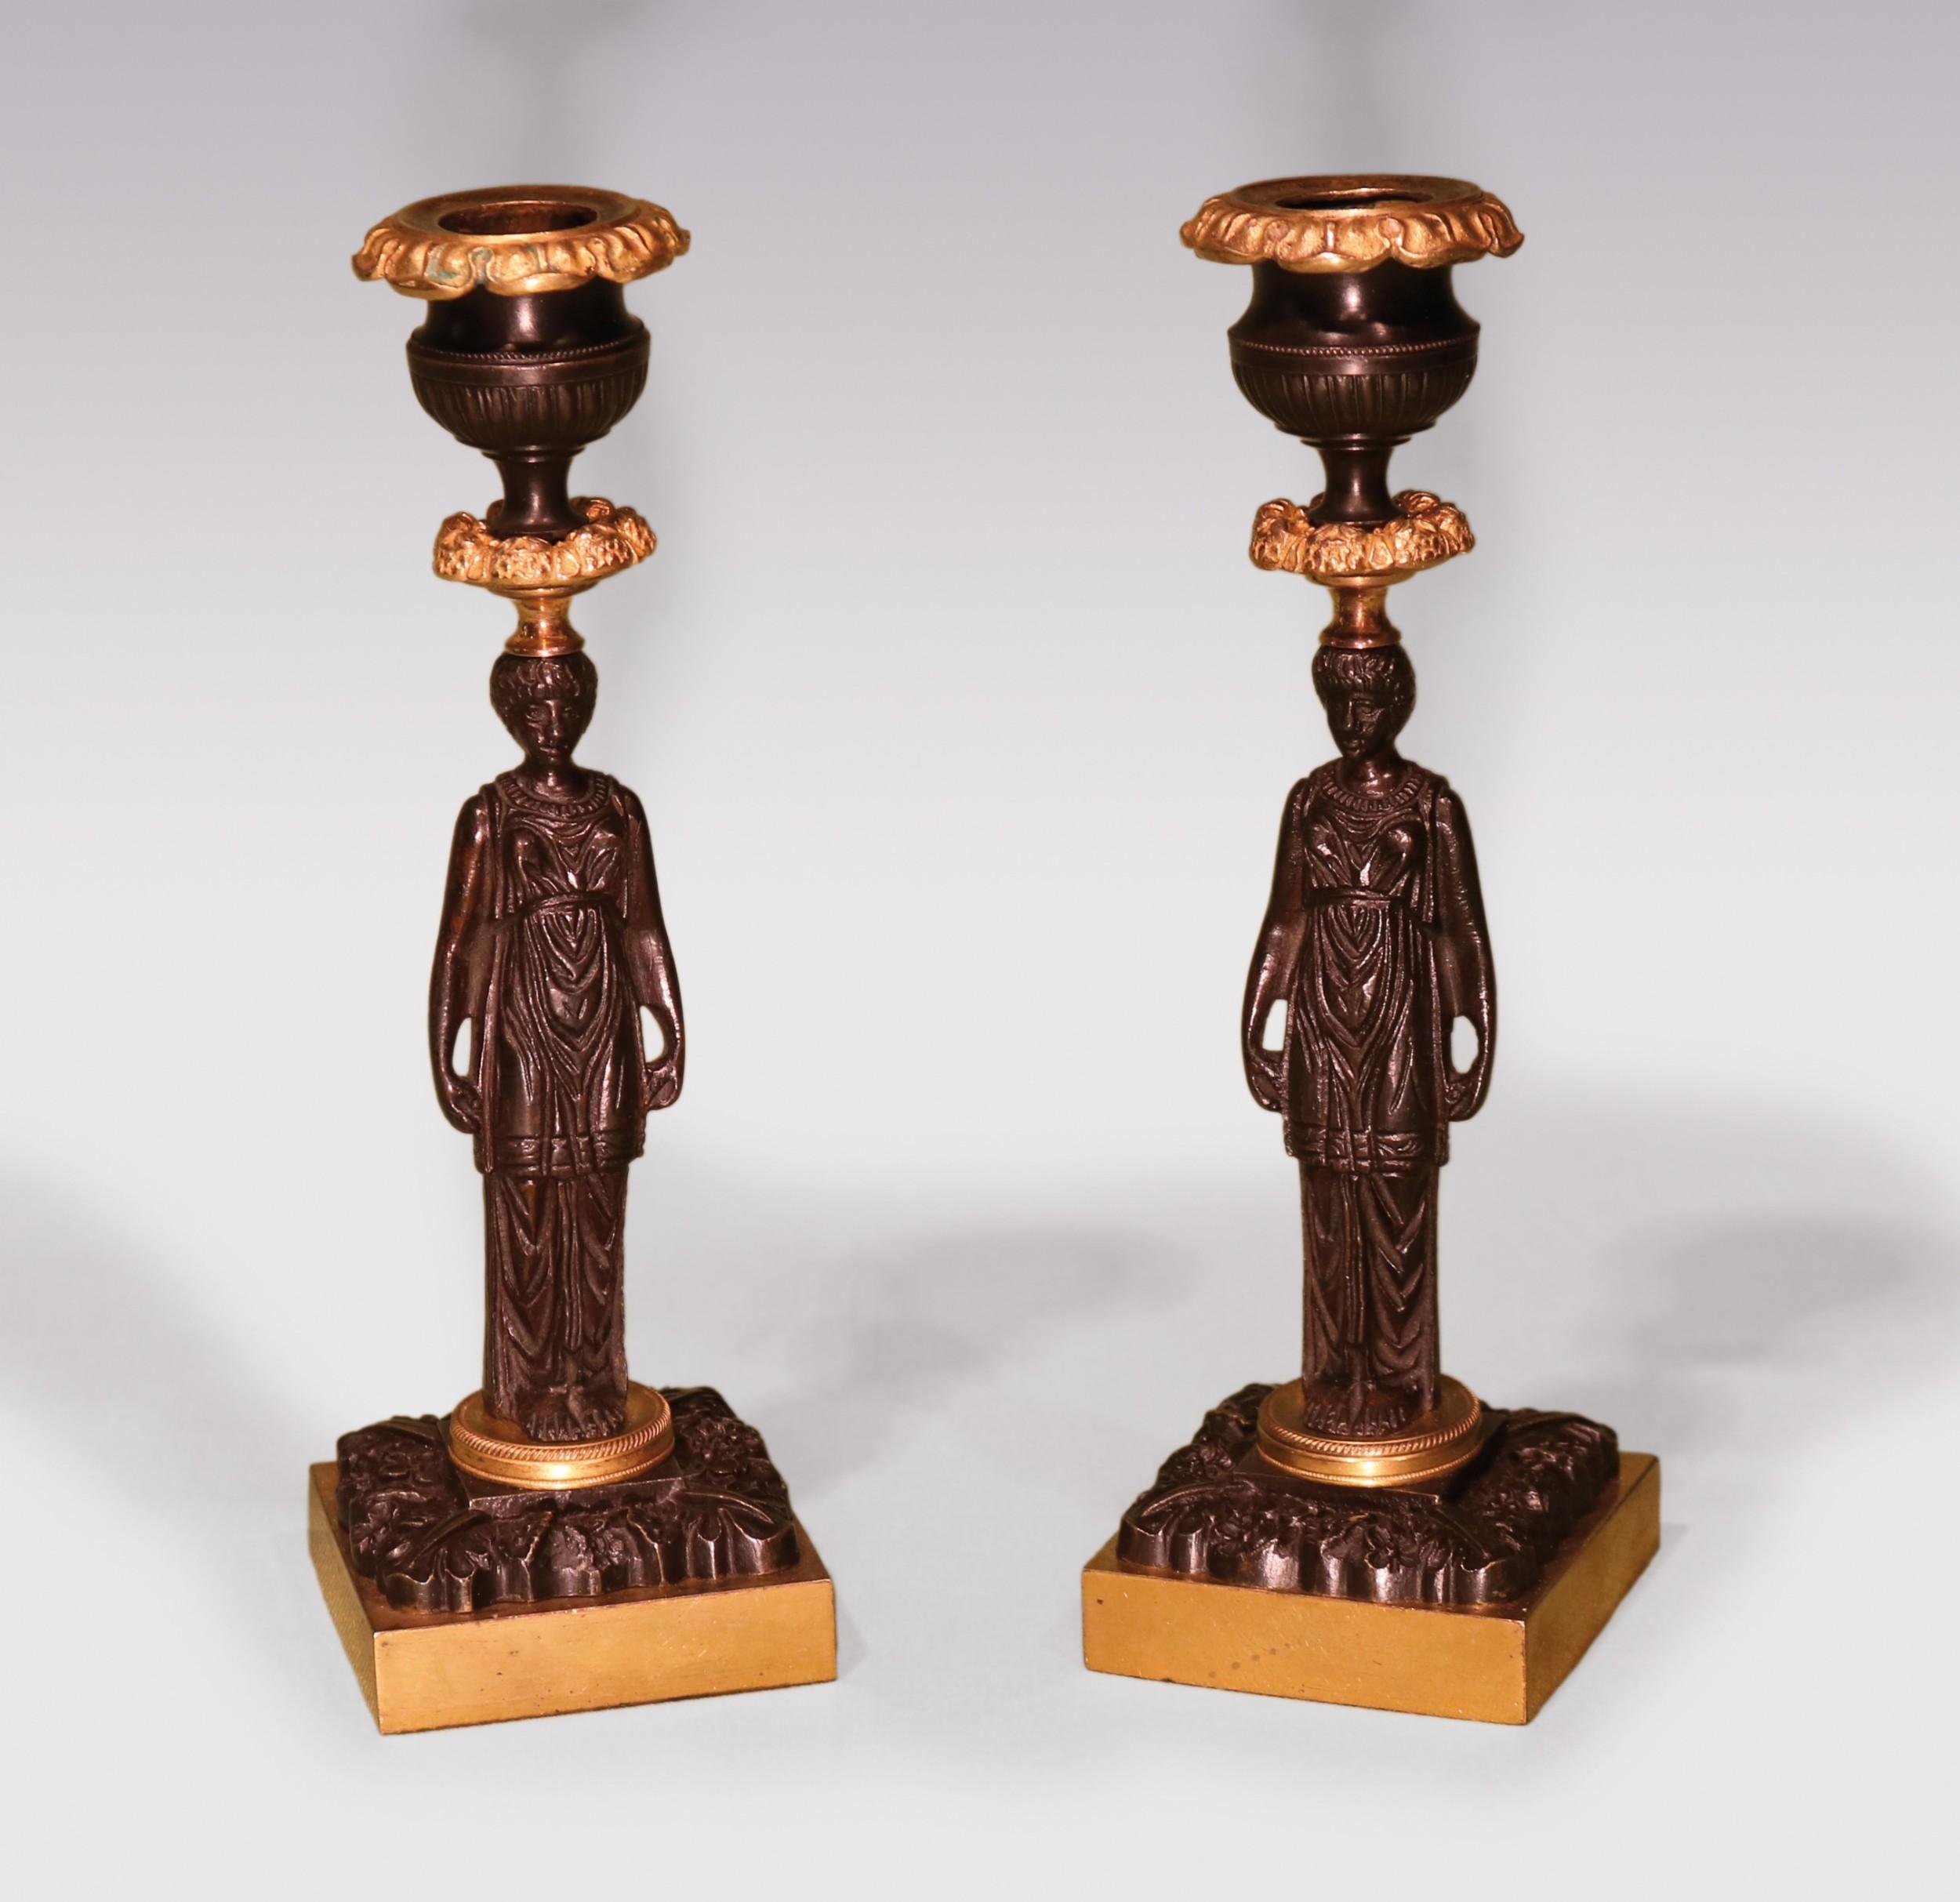 a pair of 19th century regency period bronze ormolu lady candlesticks